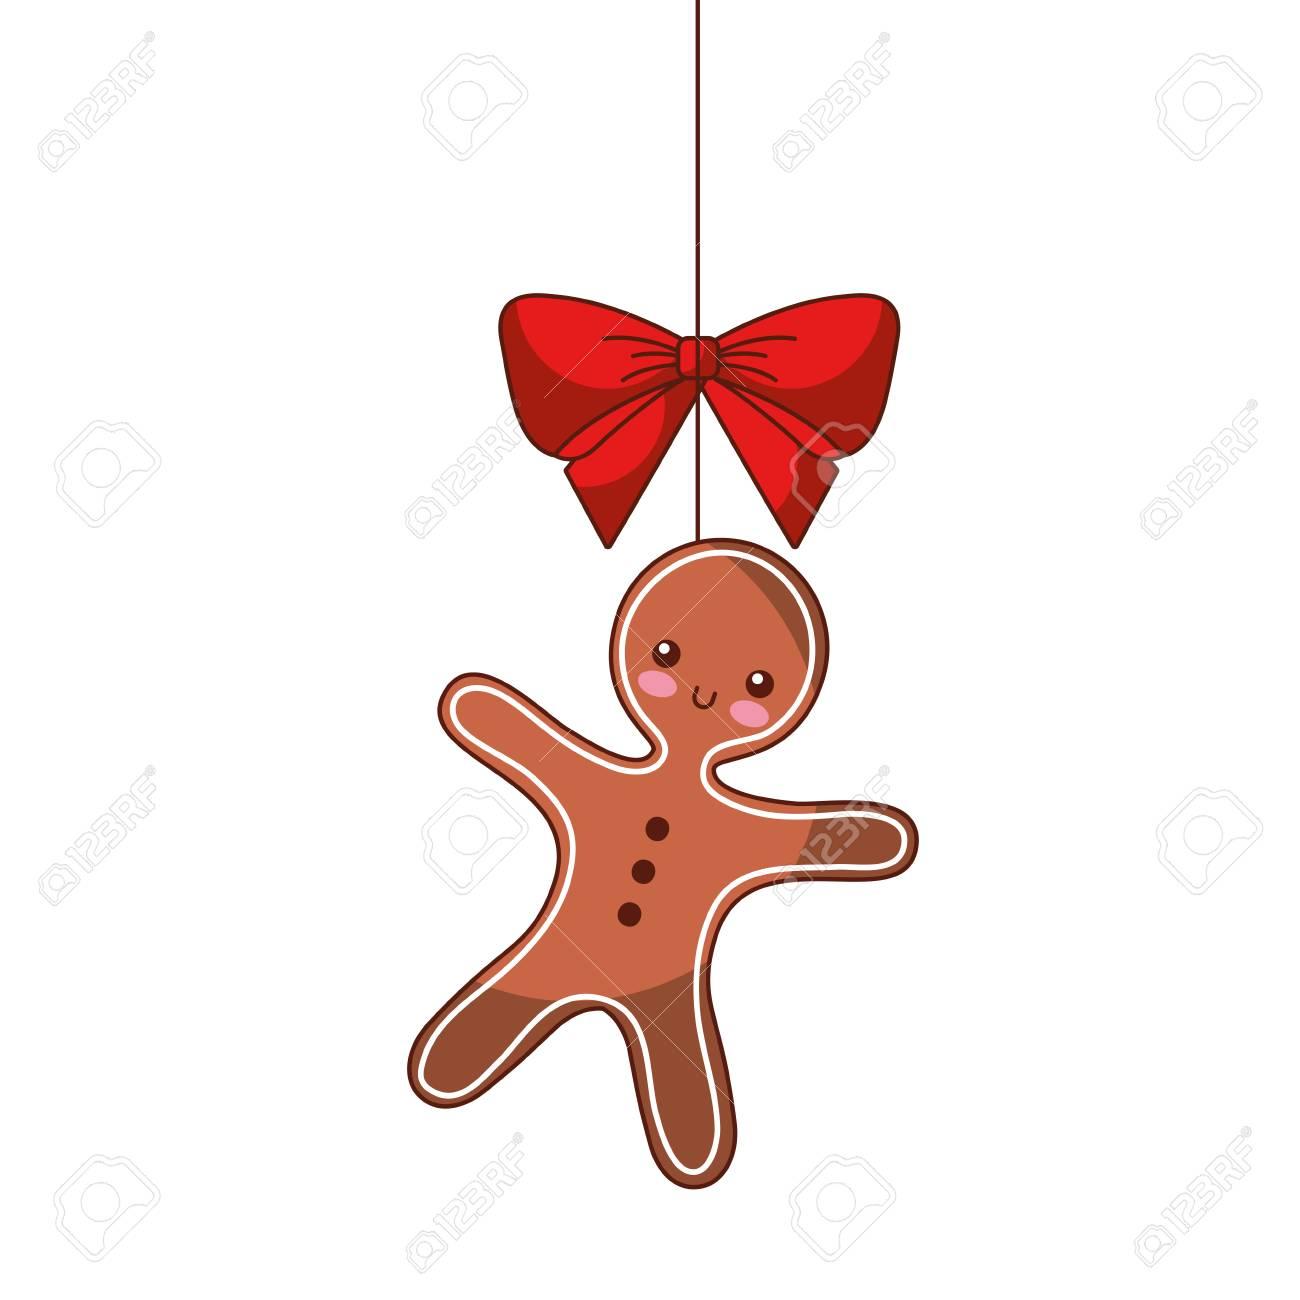 Christmas Gingerbread Man Bow Ornament Hanging Vector Illustration